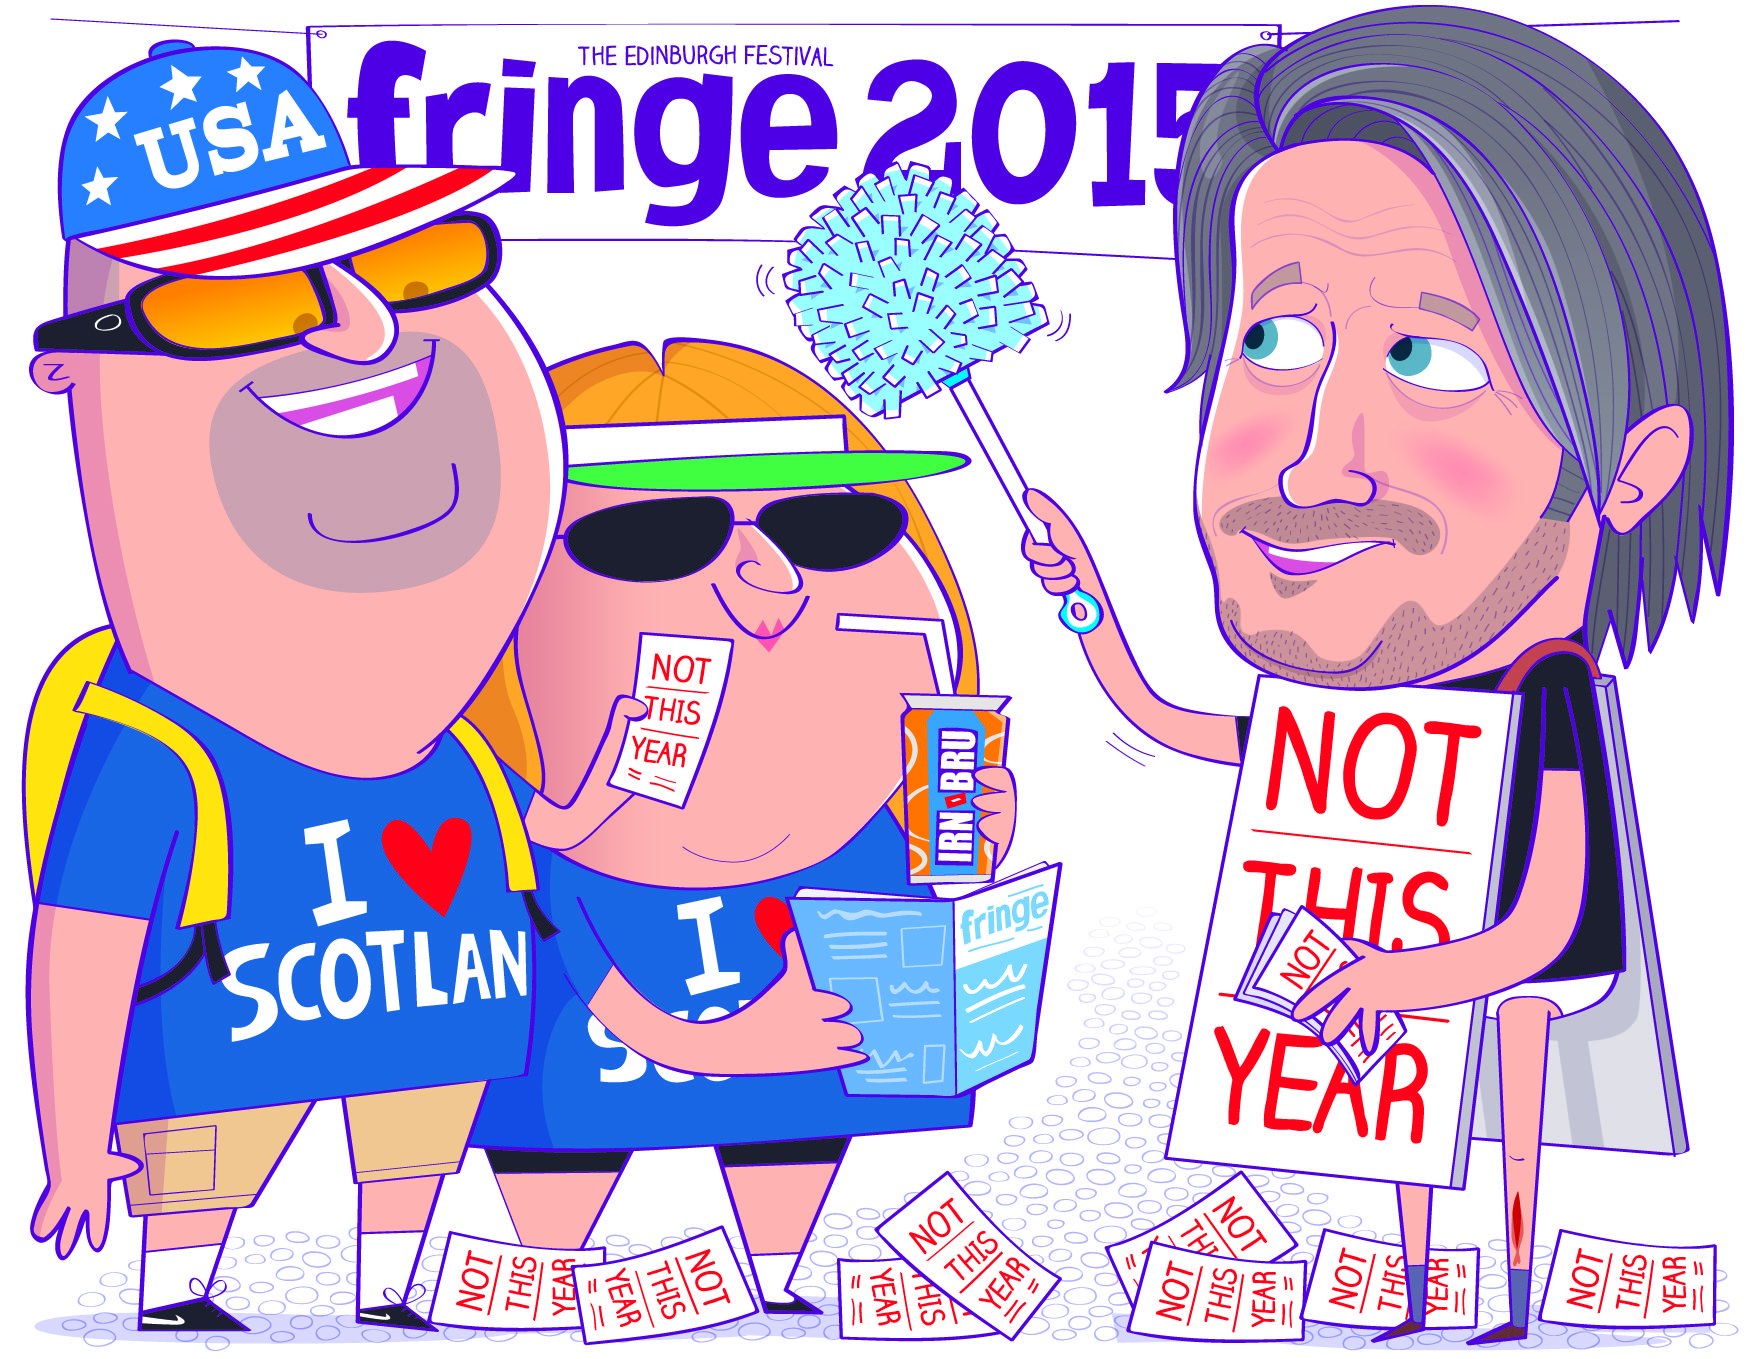 Richard Herring: Edinburgh holds no Fringe benefits